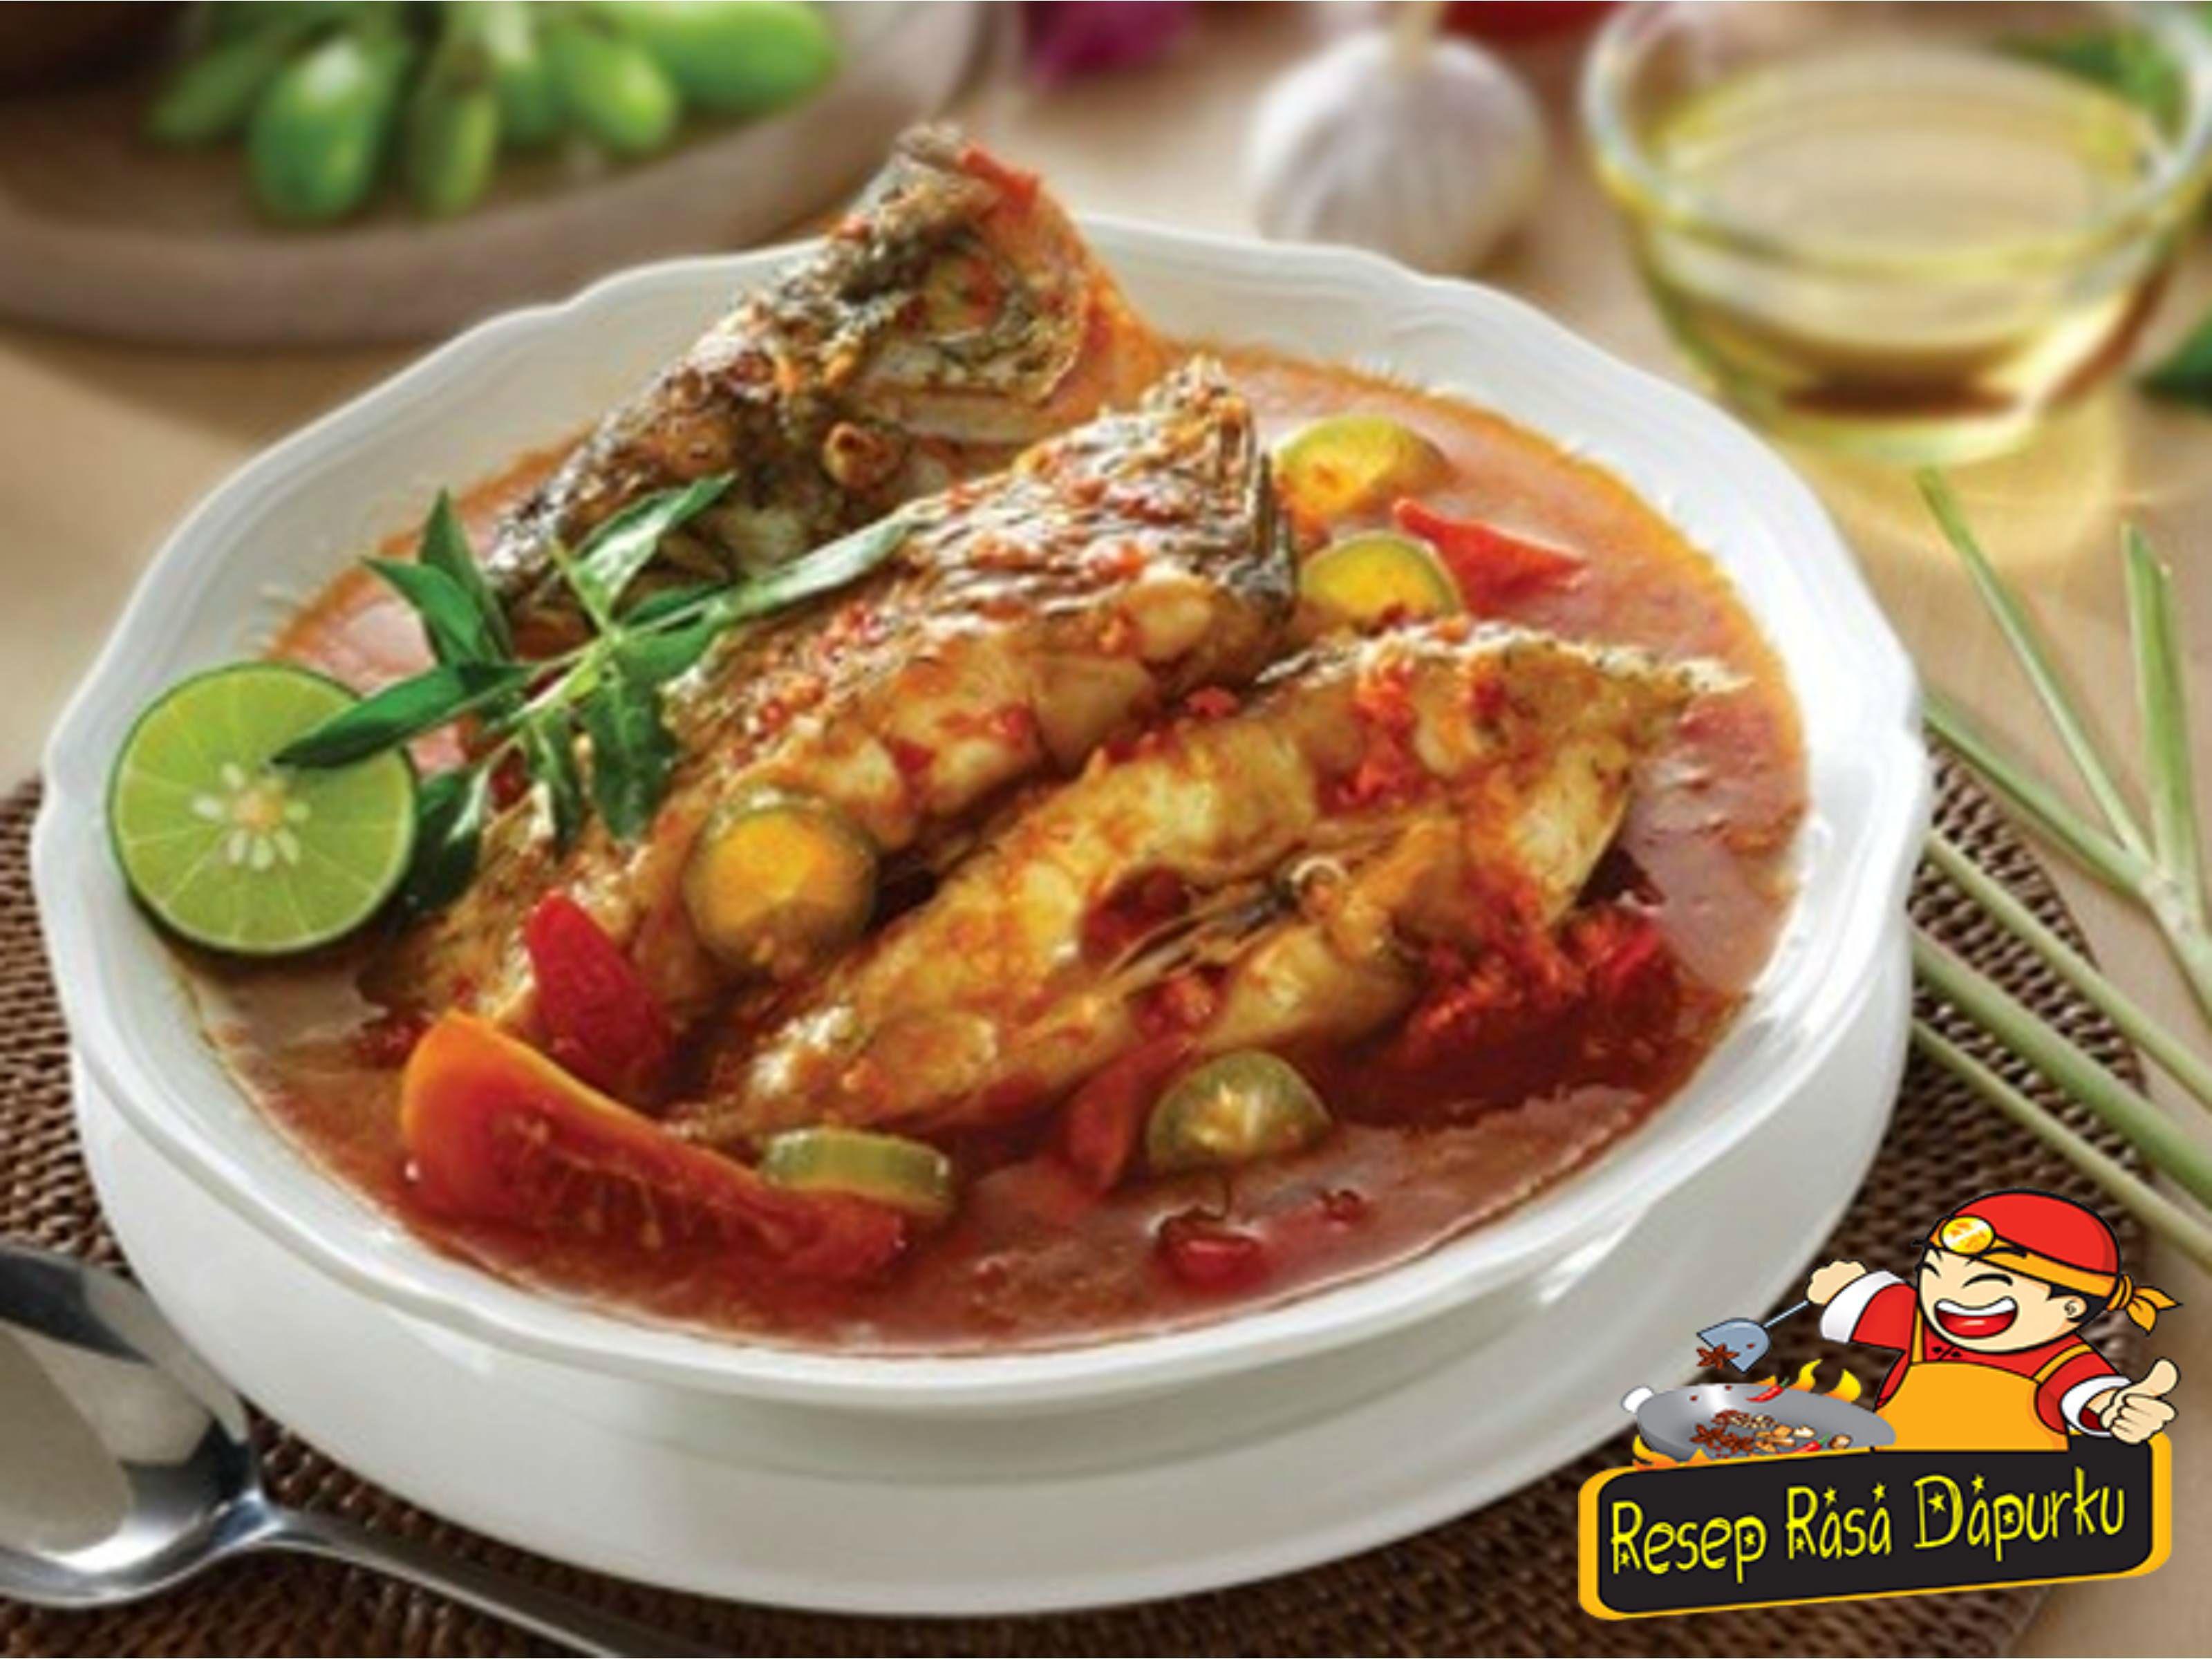 Resep Ikan Kembung Kukus Asam Gurih Food Chicken Wings Chicken